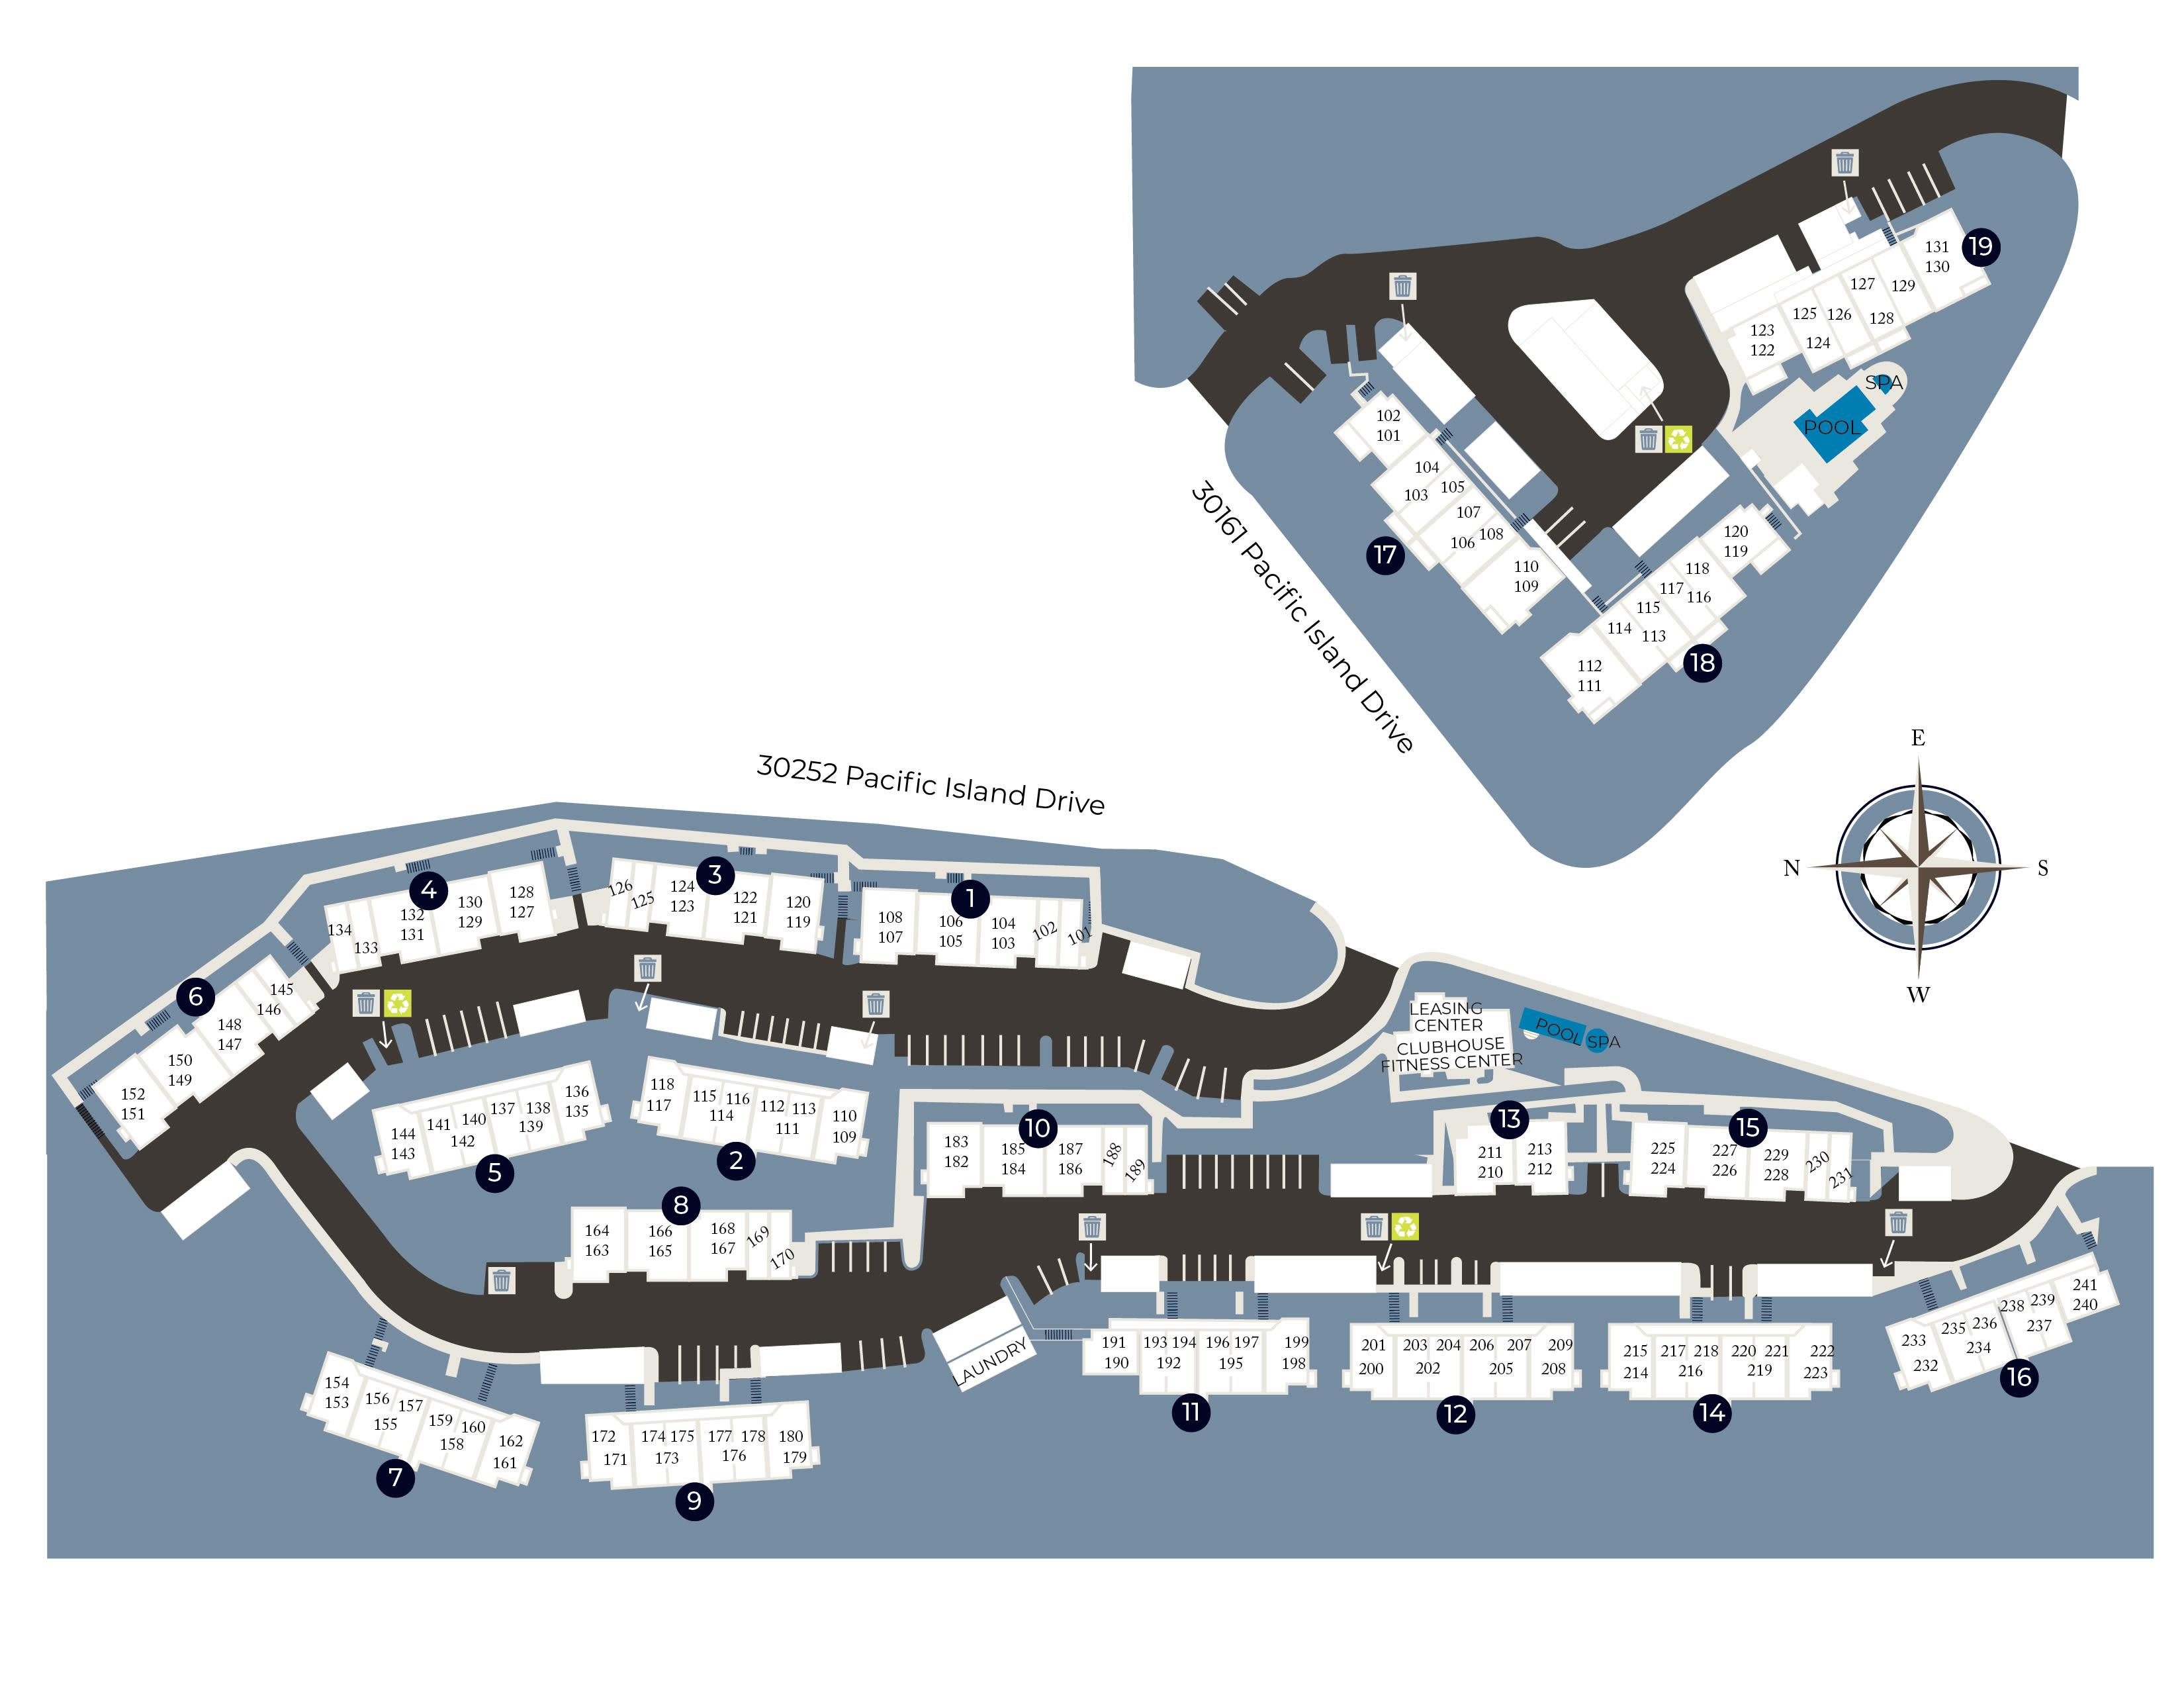 View a map of our property at Niguel Summit Condominium Rentals in Laguna Niguel, California